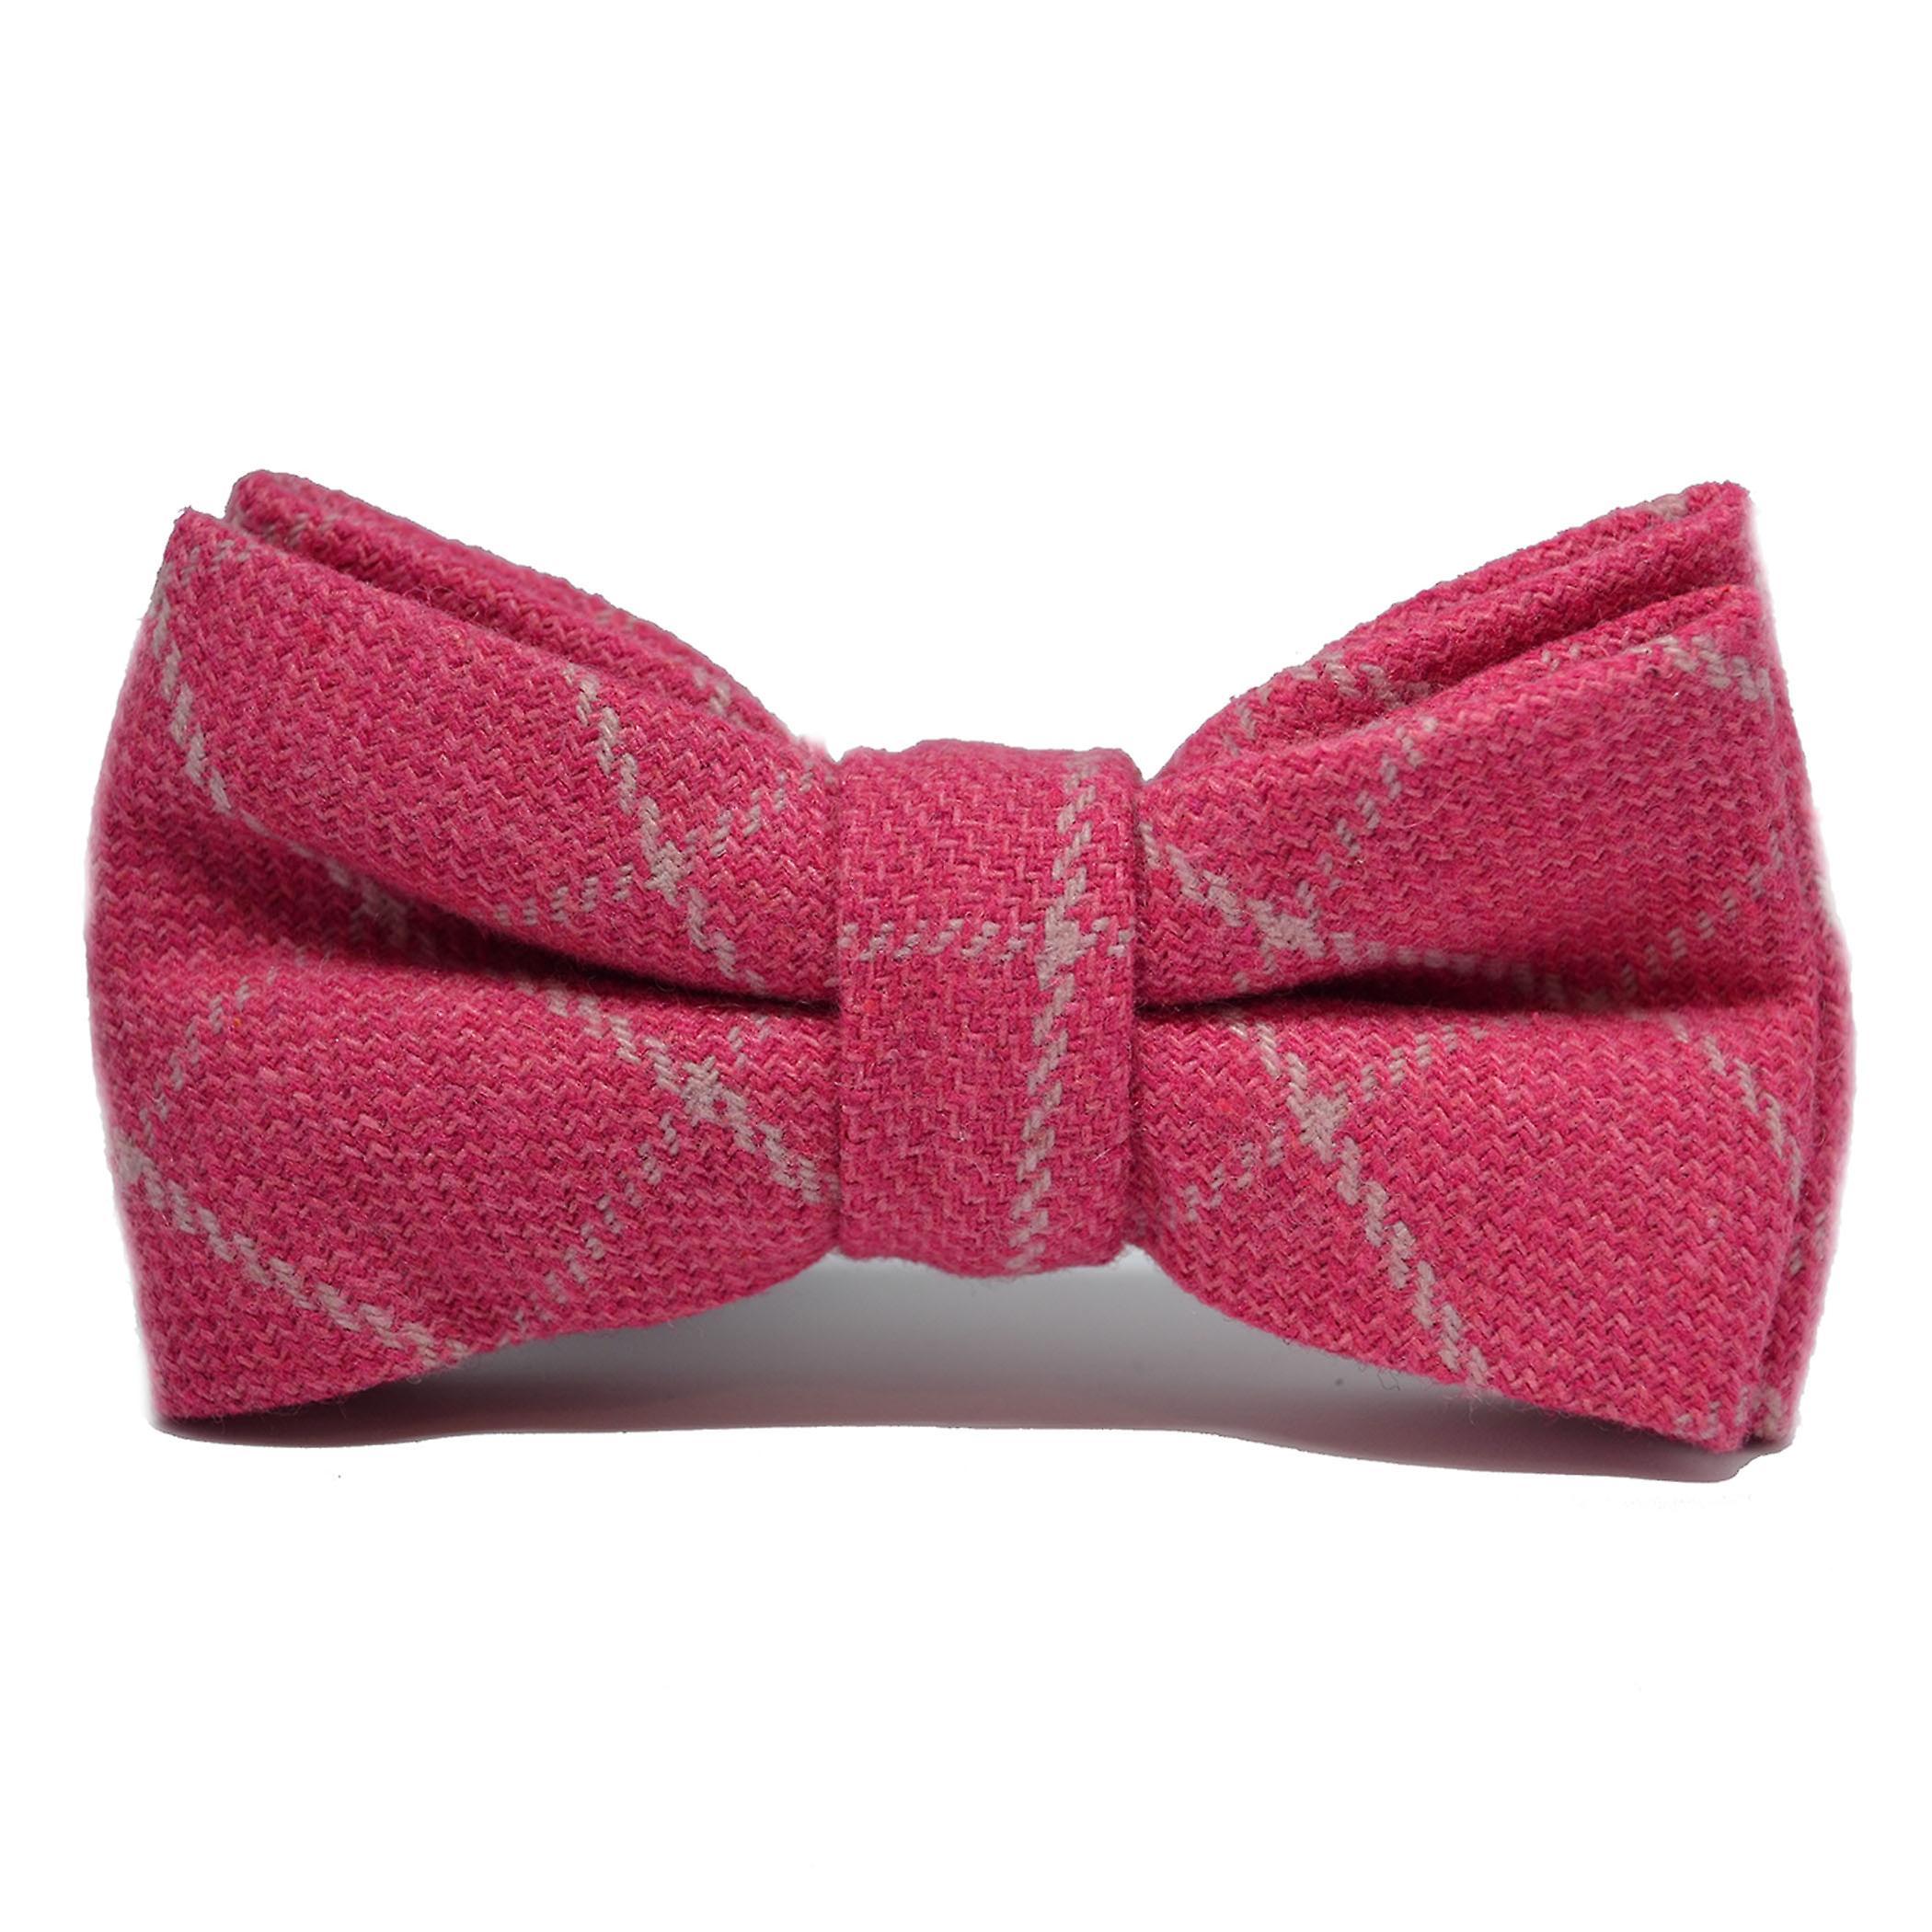 Fuschia Pink Birdseye Check Bow Tie & Pocket Square Set